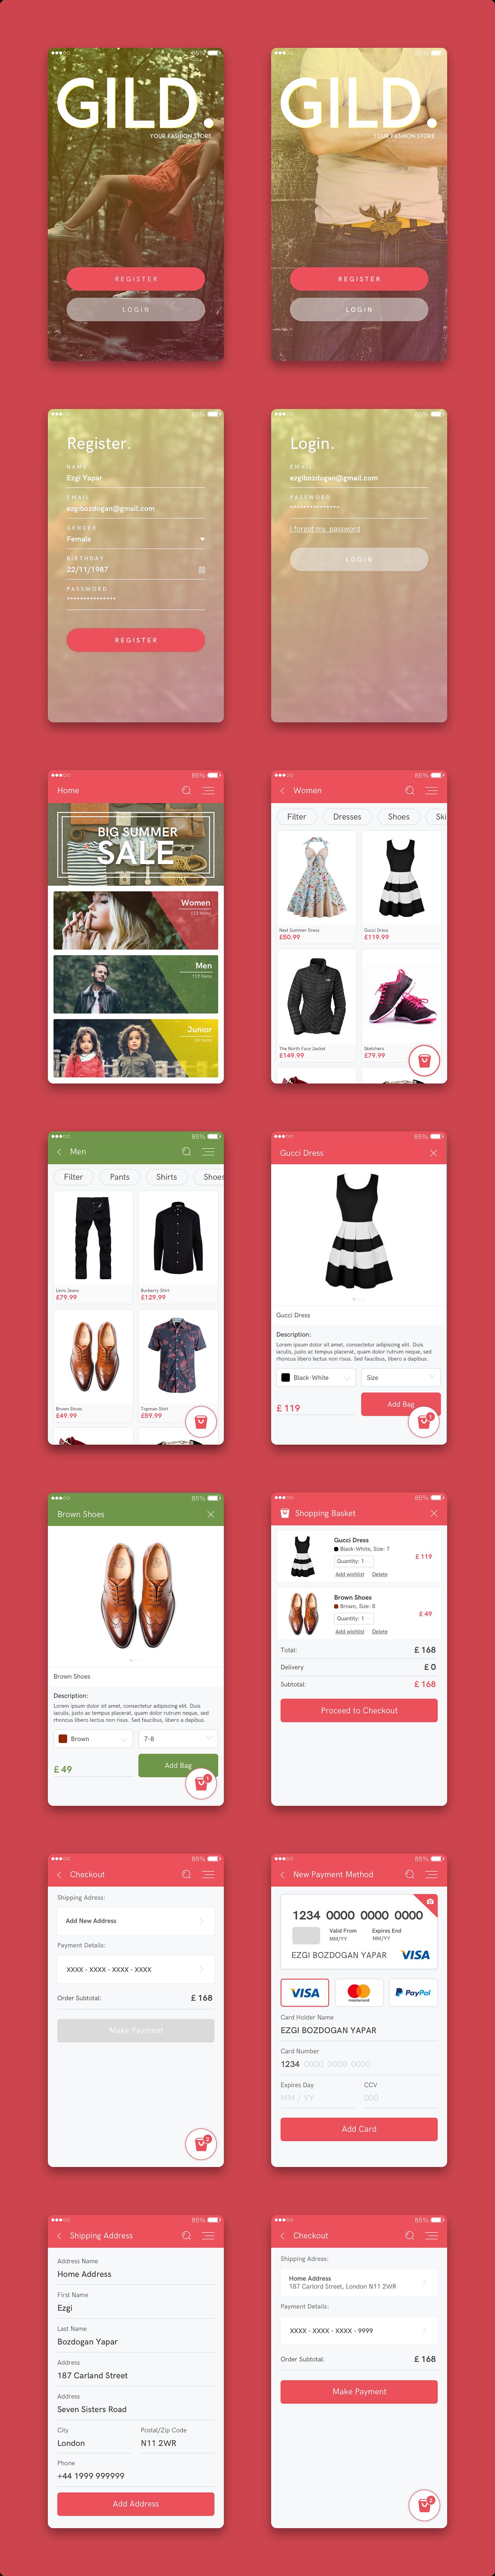 mobile ui design Ecommerce